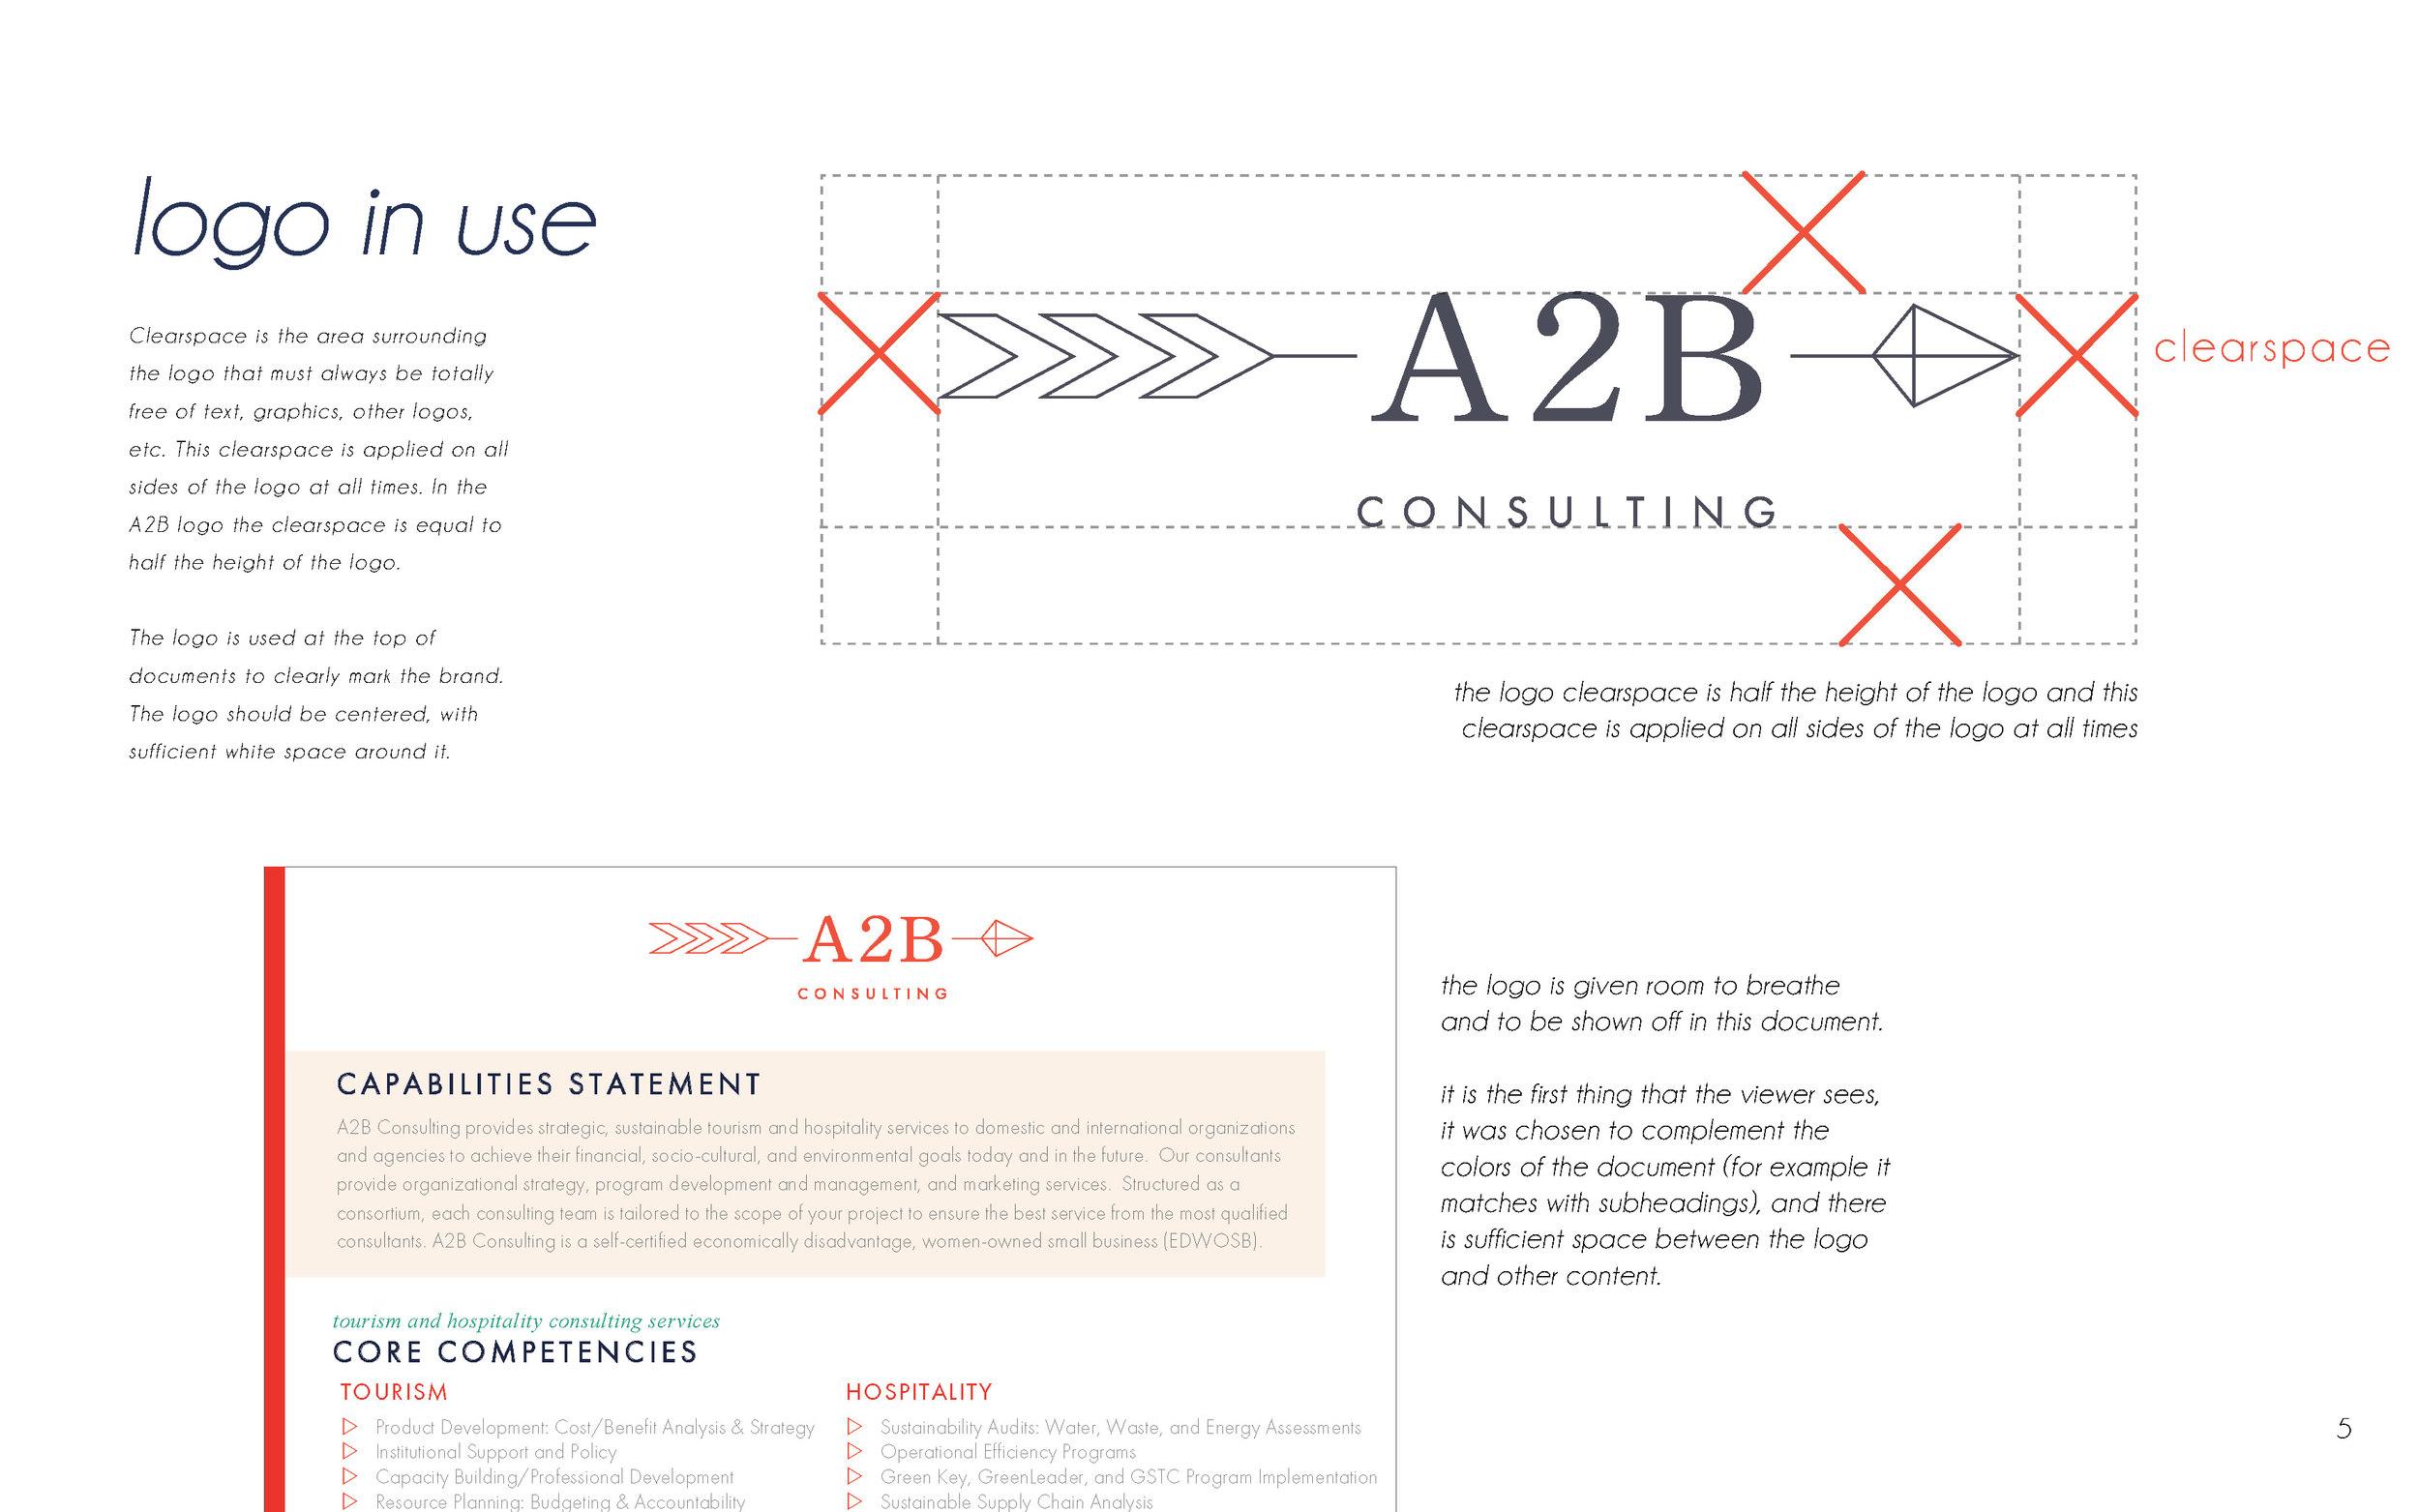 StyleGuide_A2B_02_27_Page_05.jpg